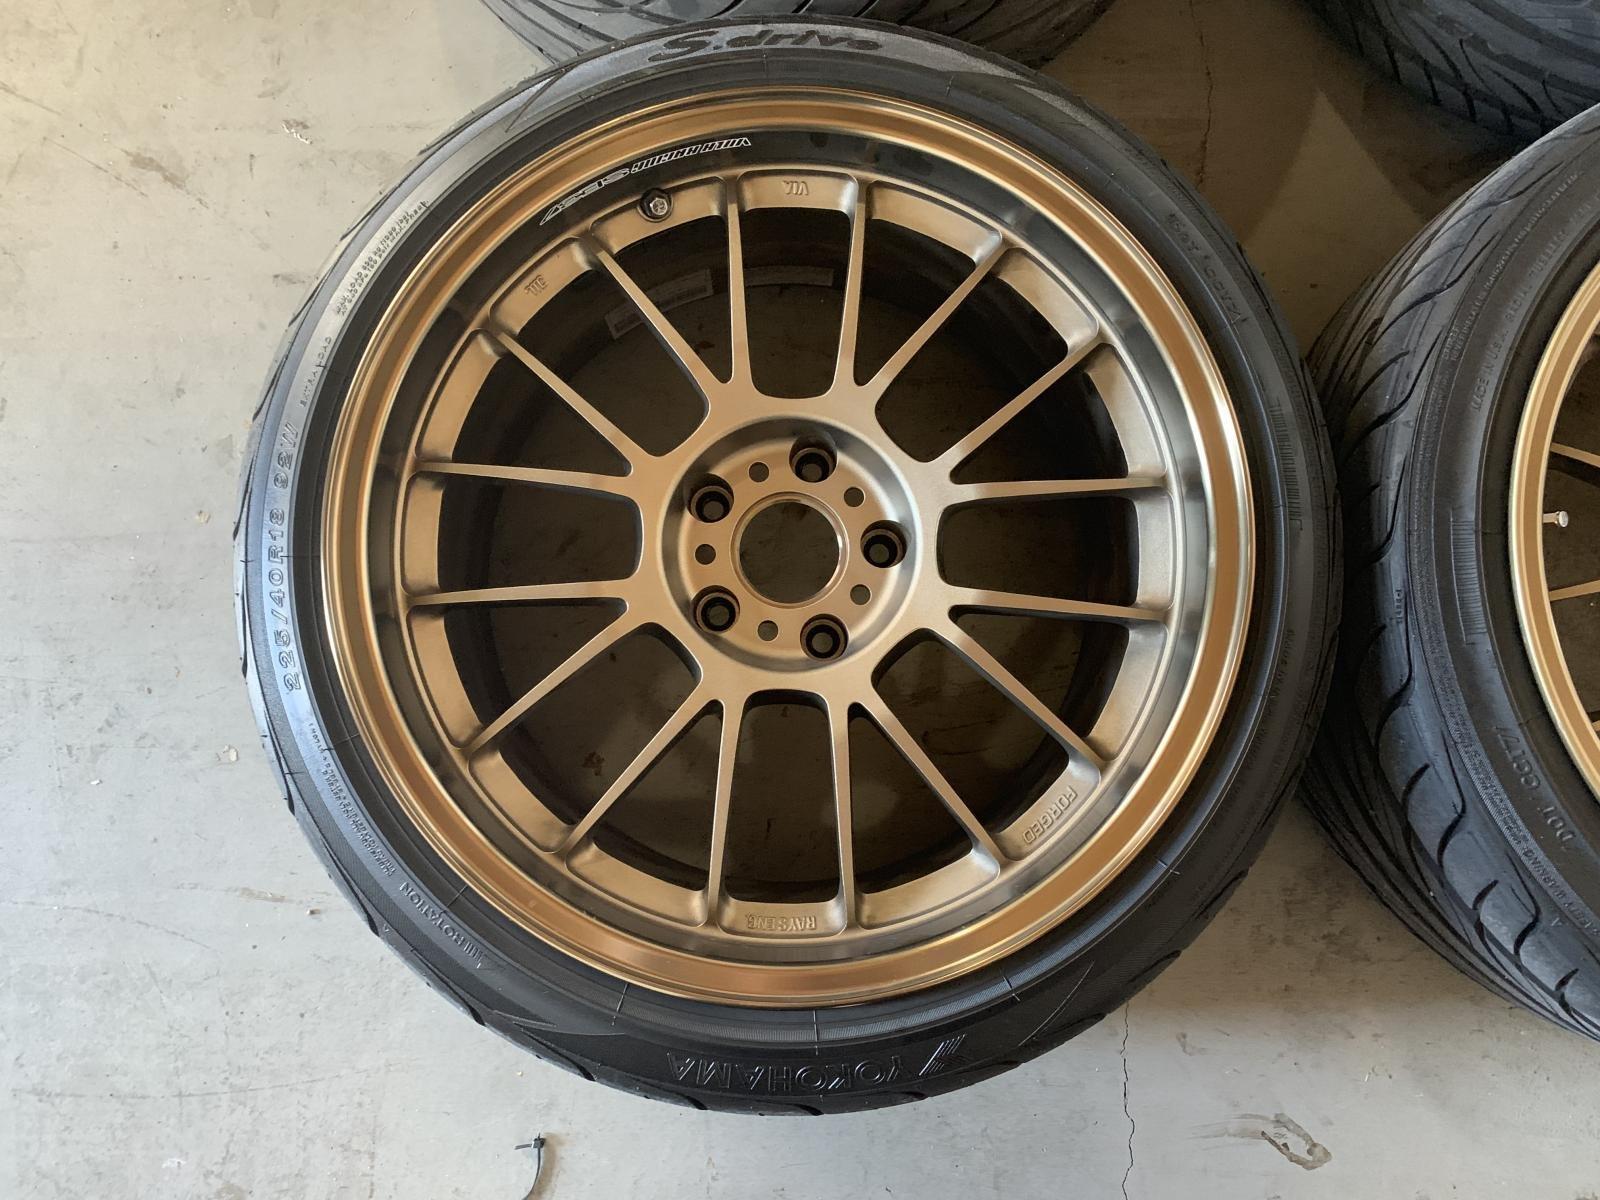 Rare volk racing se37 bronze og bronze-image1-4-.jpg